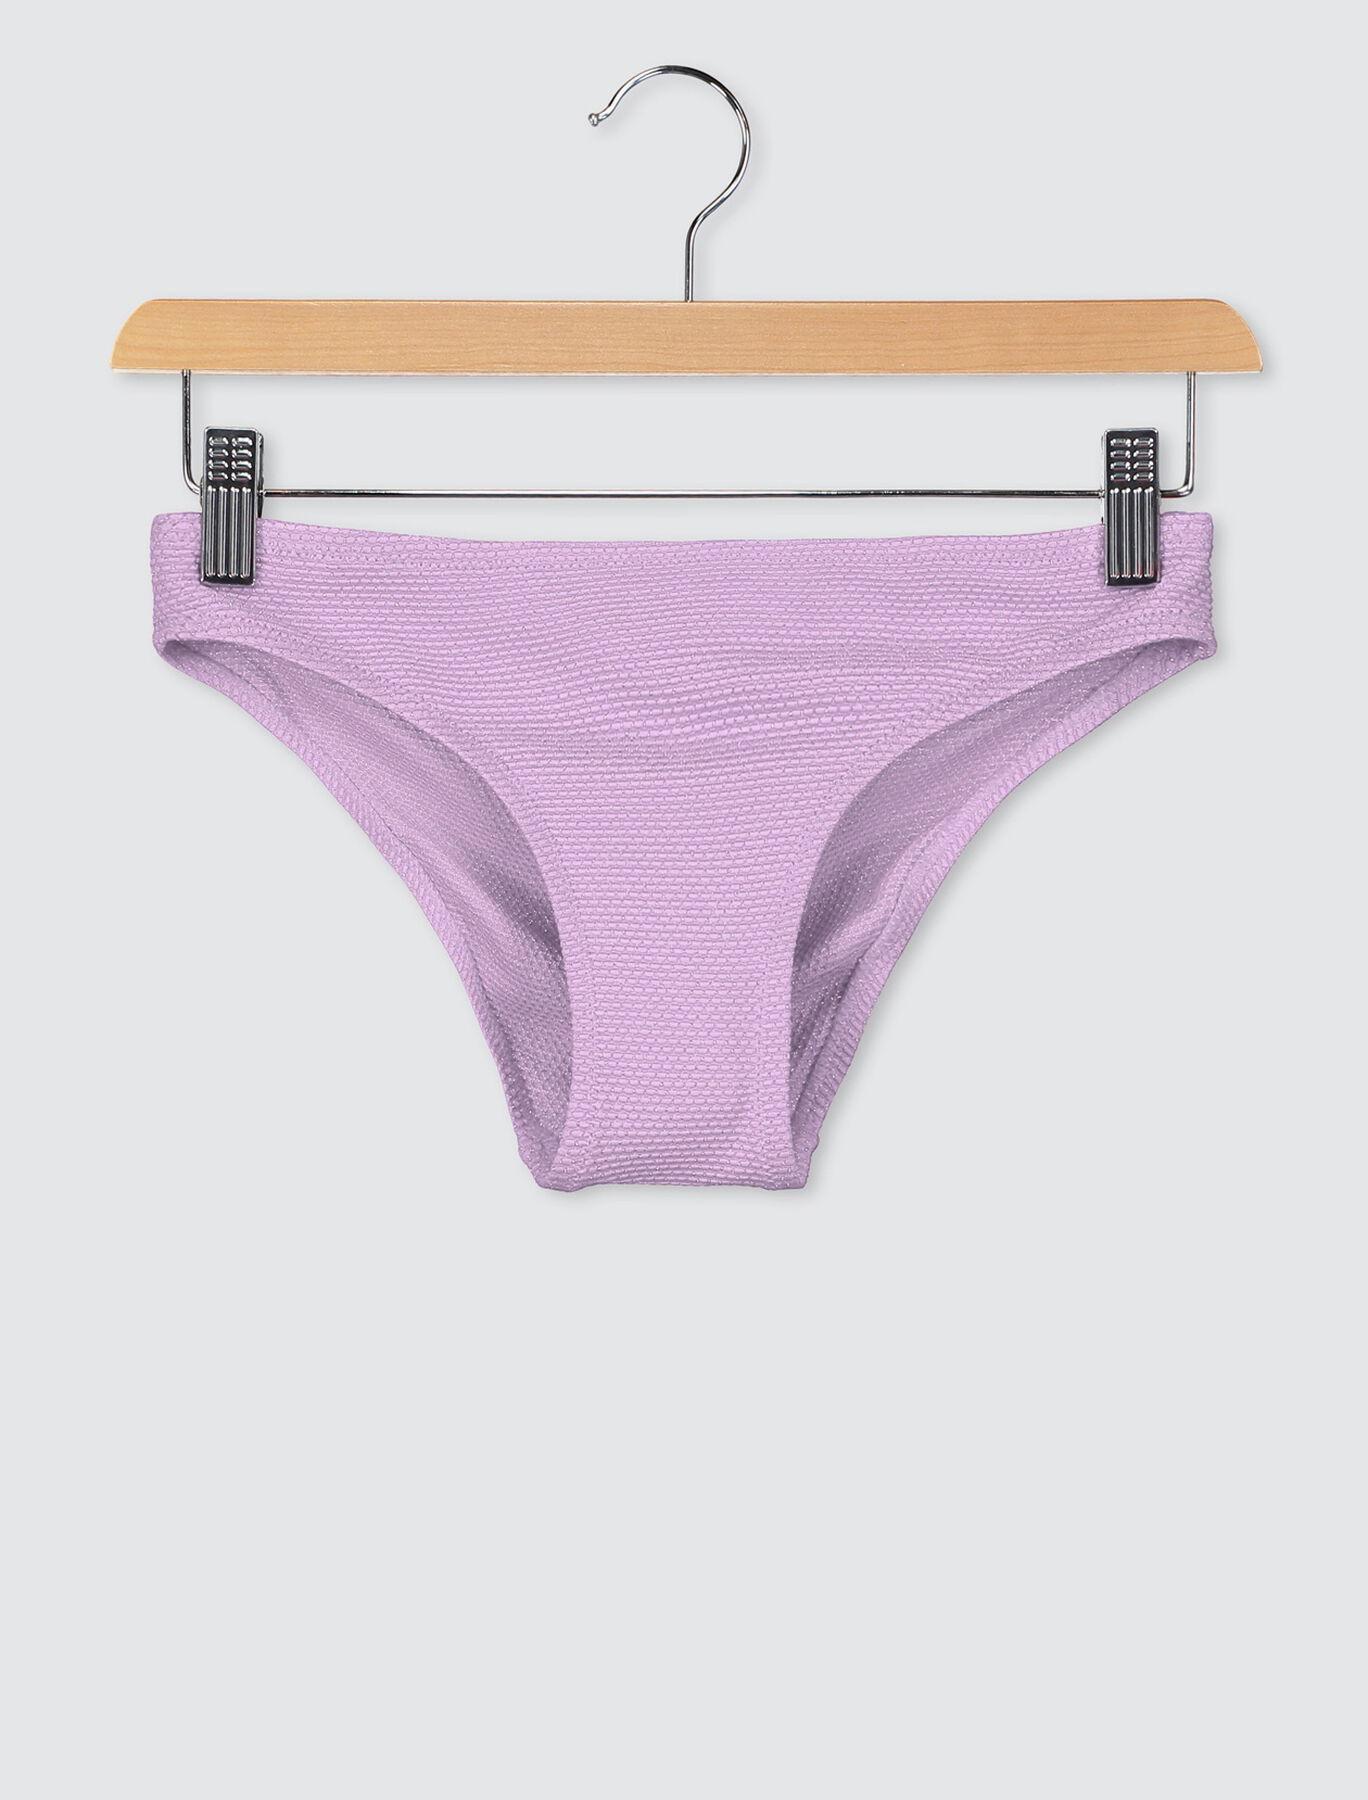 Bas de maillot de bain culotte